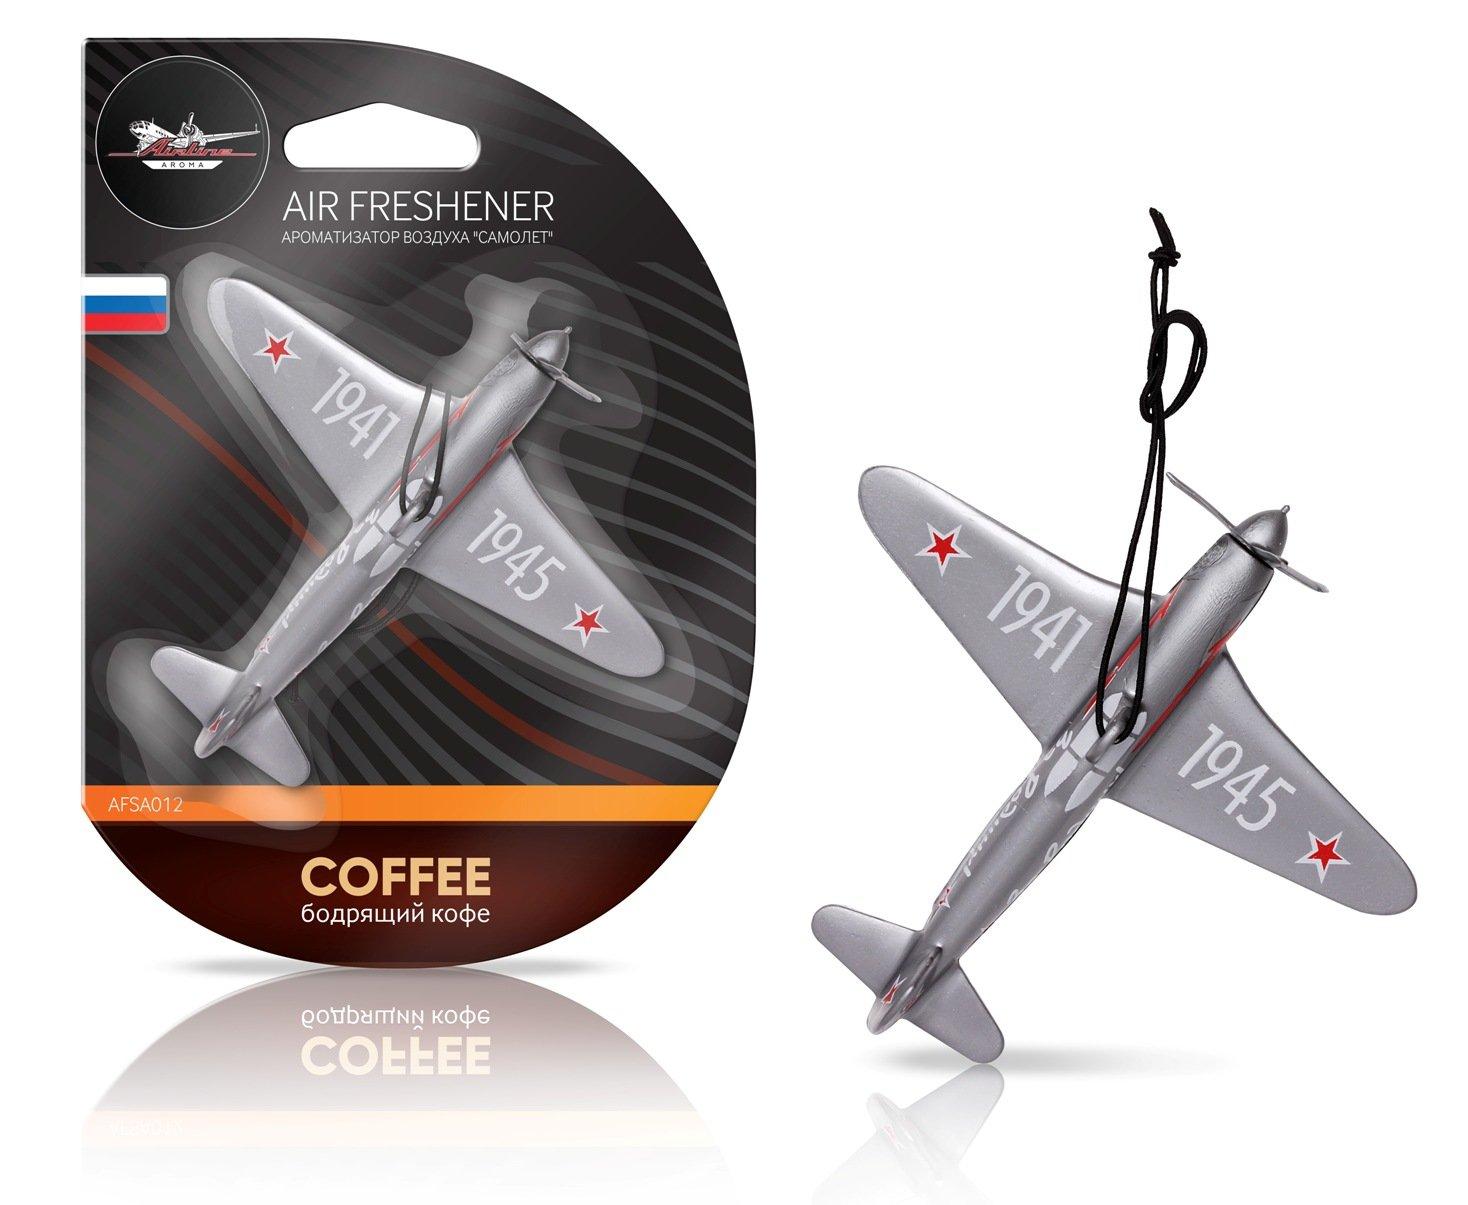 Ароматизатор на зеркало Airline самолет бодрящий кофе AFSA012